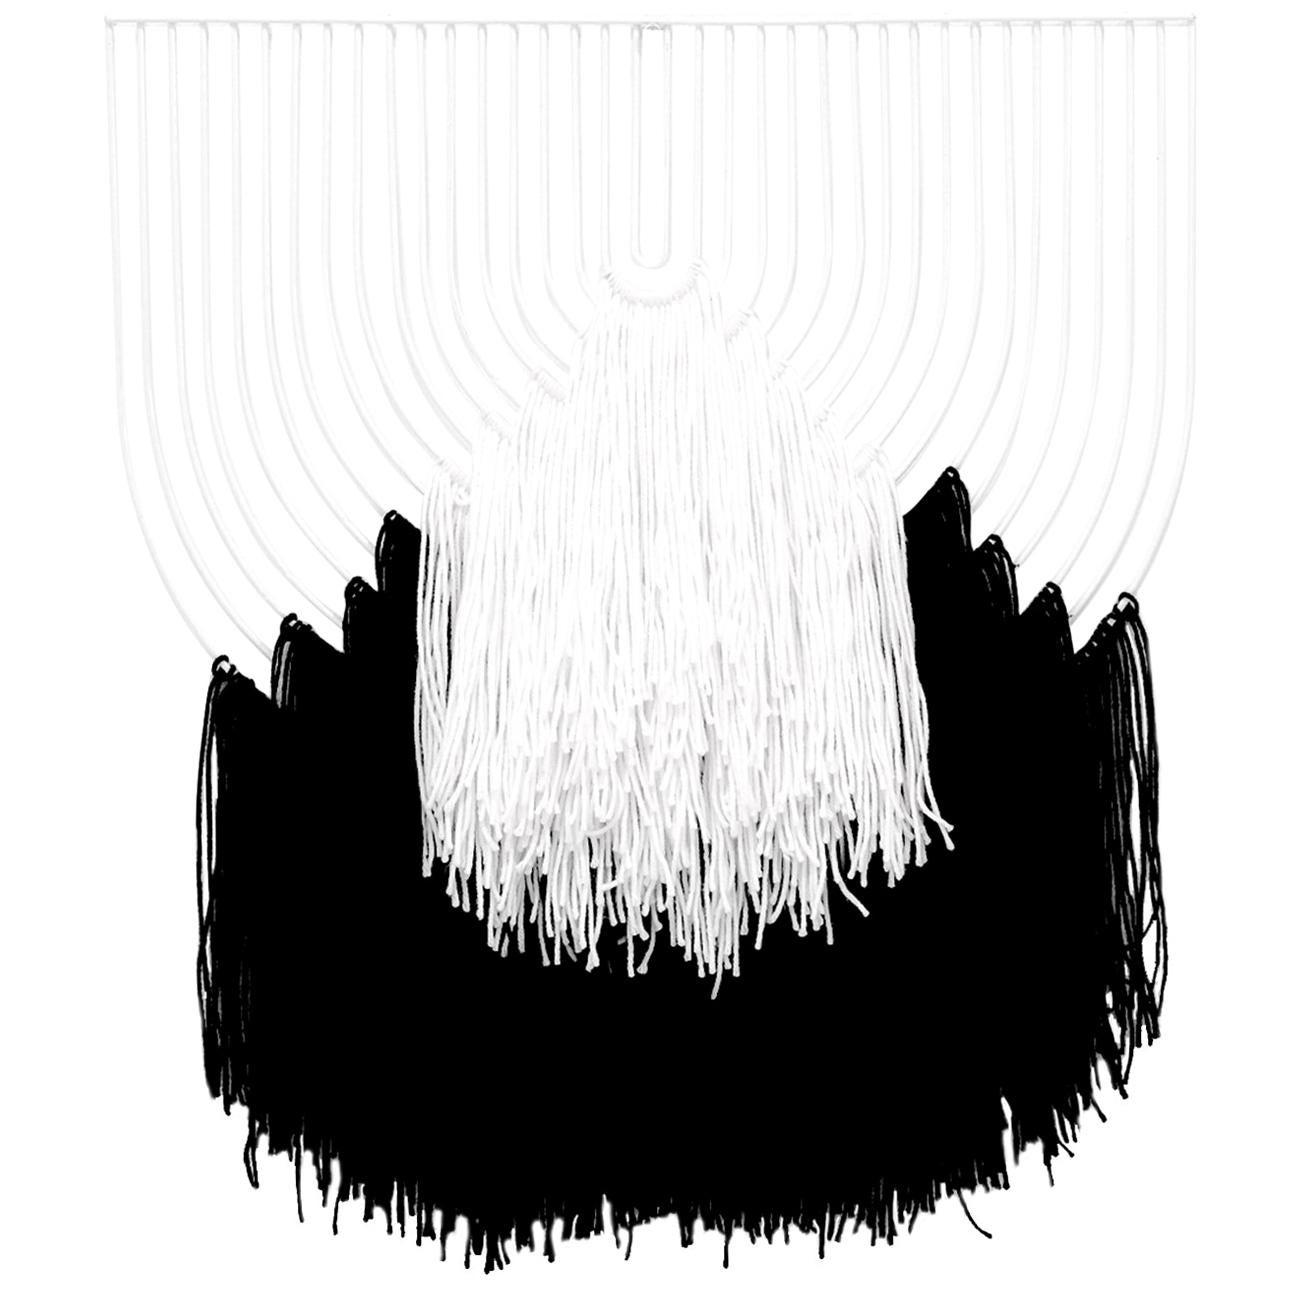 Modern Macrame Art, Wire Macrame Art Piece by Bend Goods, Black/White